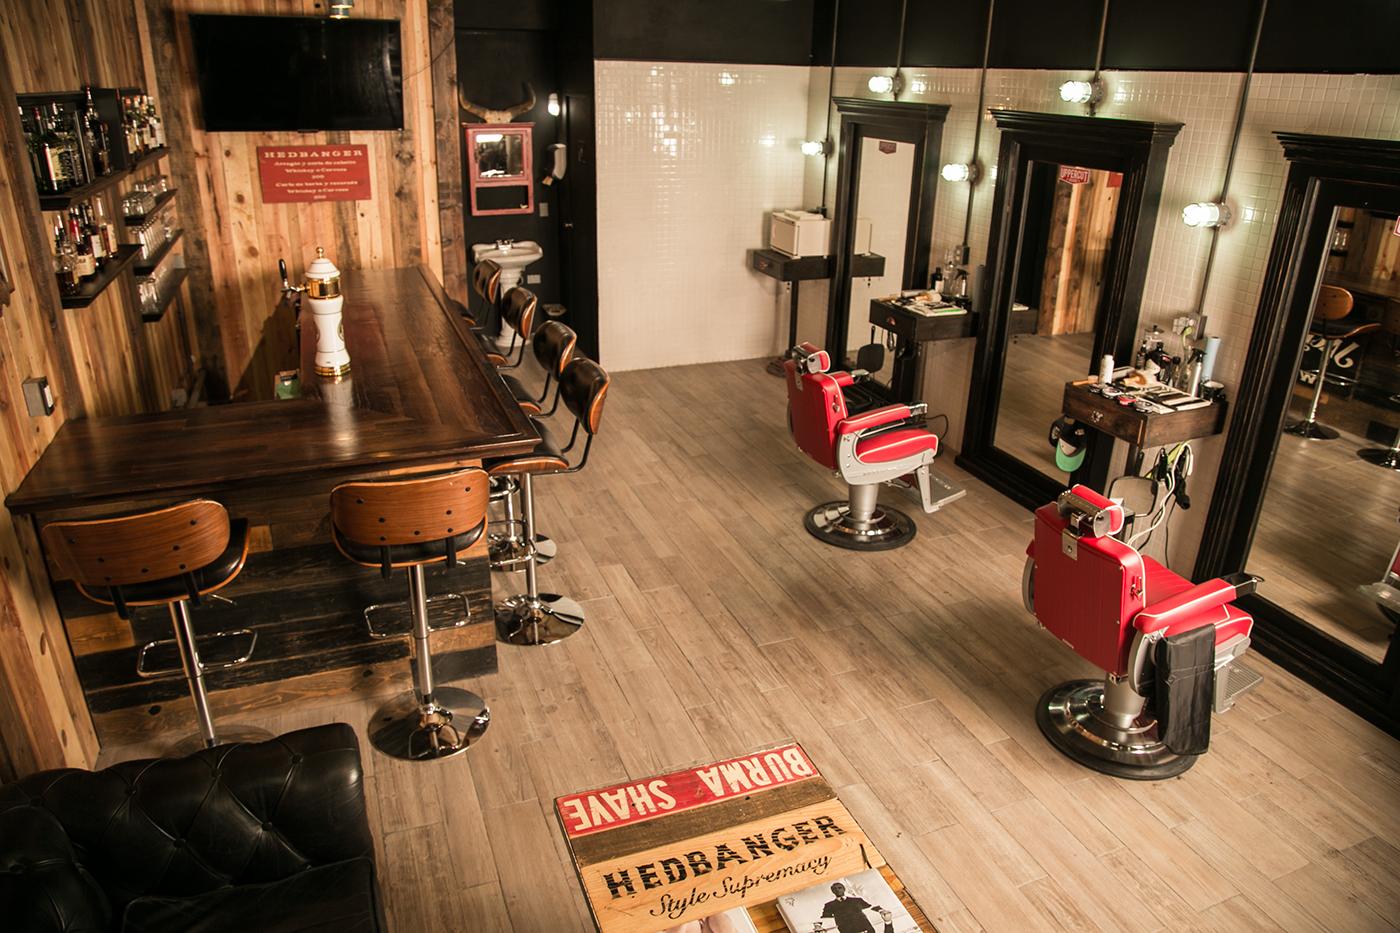 Hedbanger barbershop whiskey bar on behance for The barbershop a hair salon for men